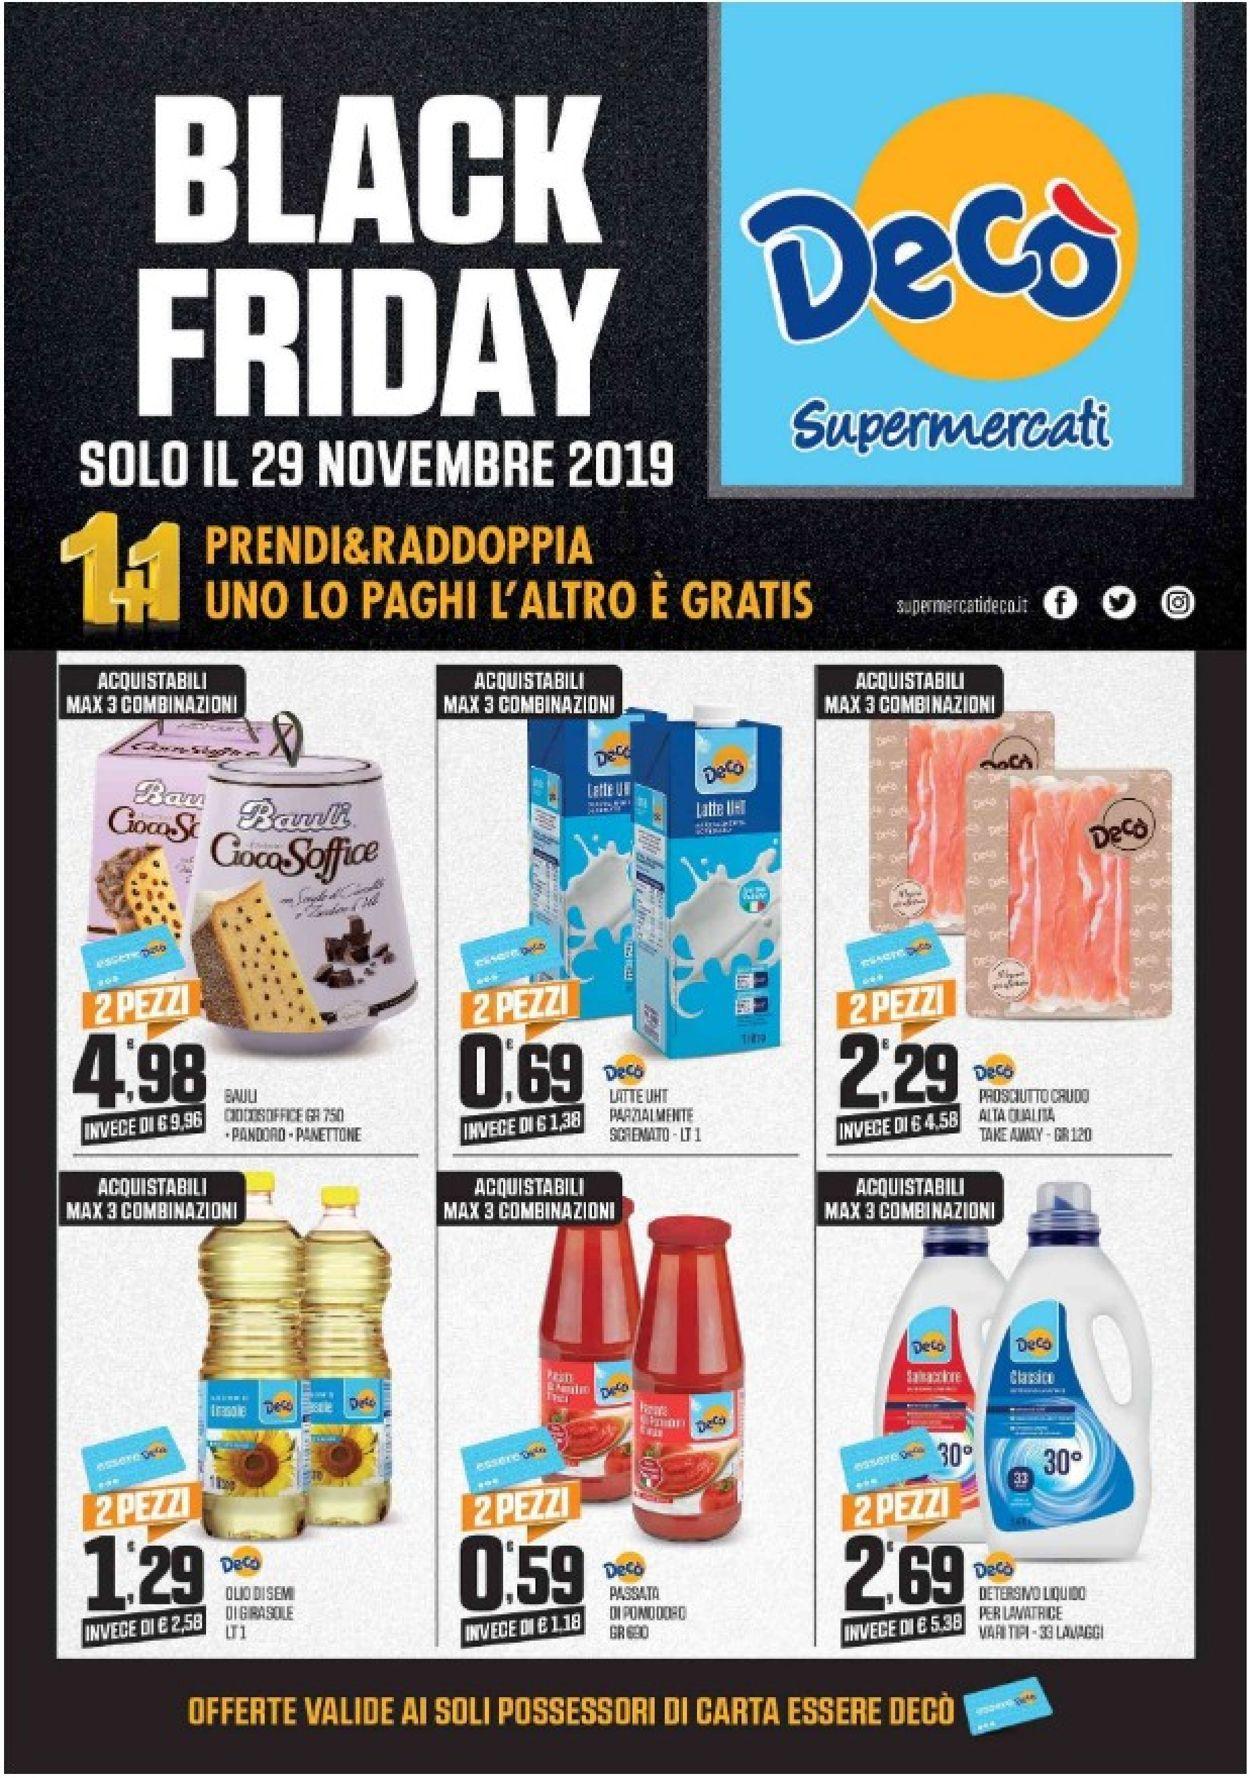 Volantino Deco - Black Friday 2019 - Offerte 29/11-29/11/2019